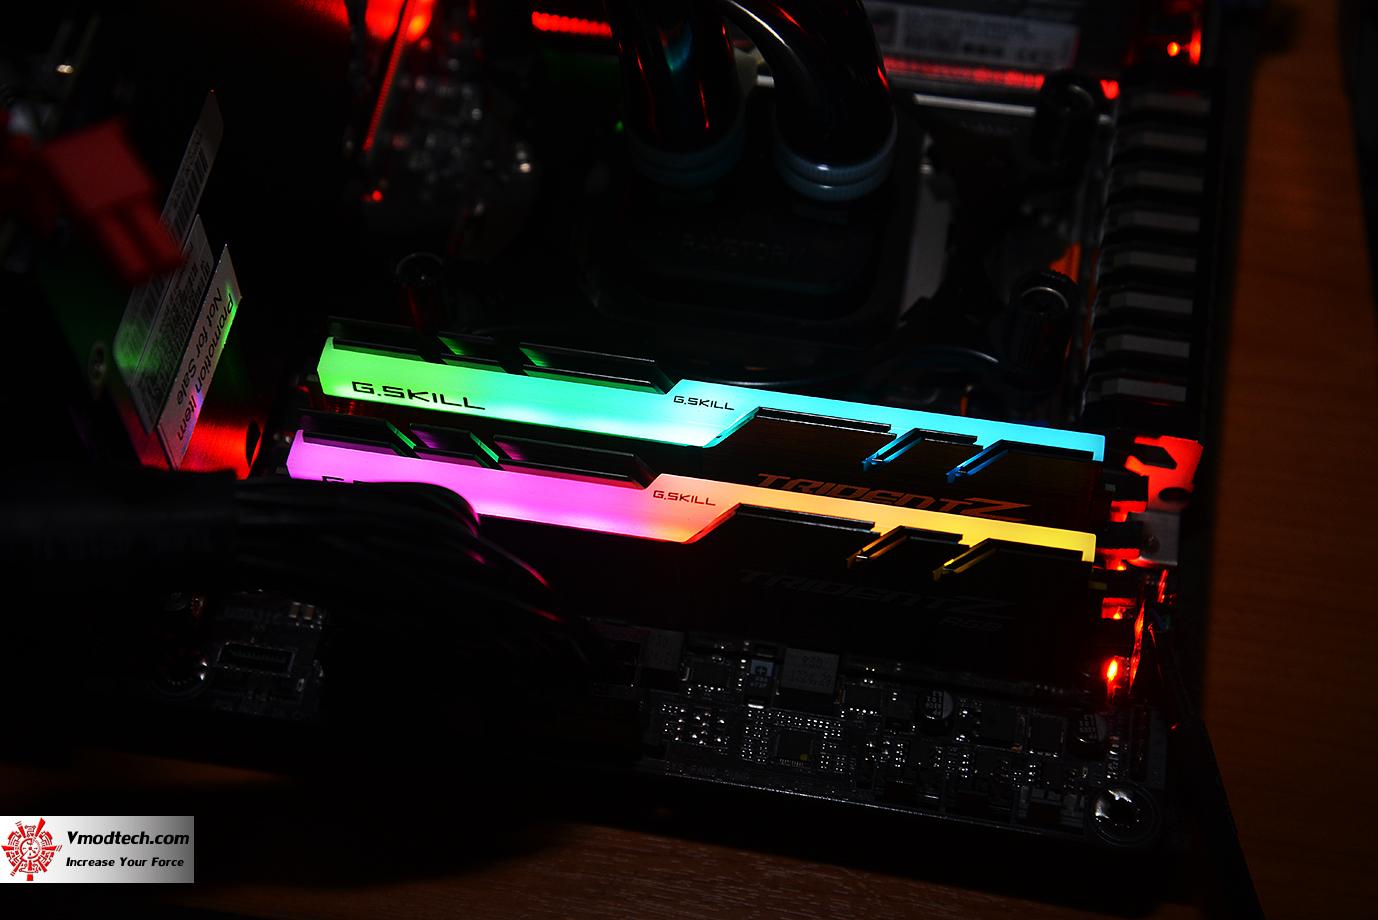 dsc 2986 G.SKILL Trident Z RGB DDR4 3200MHz 32GB (8GBx4) Quad Channel Review